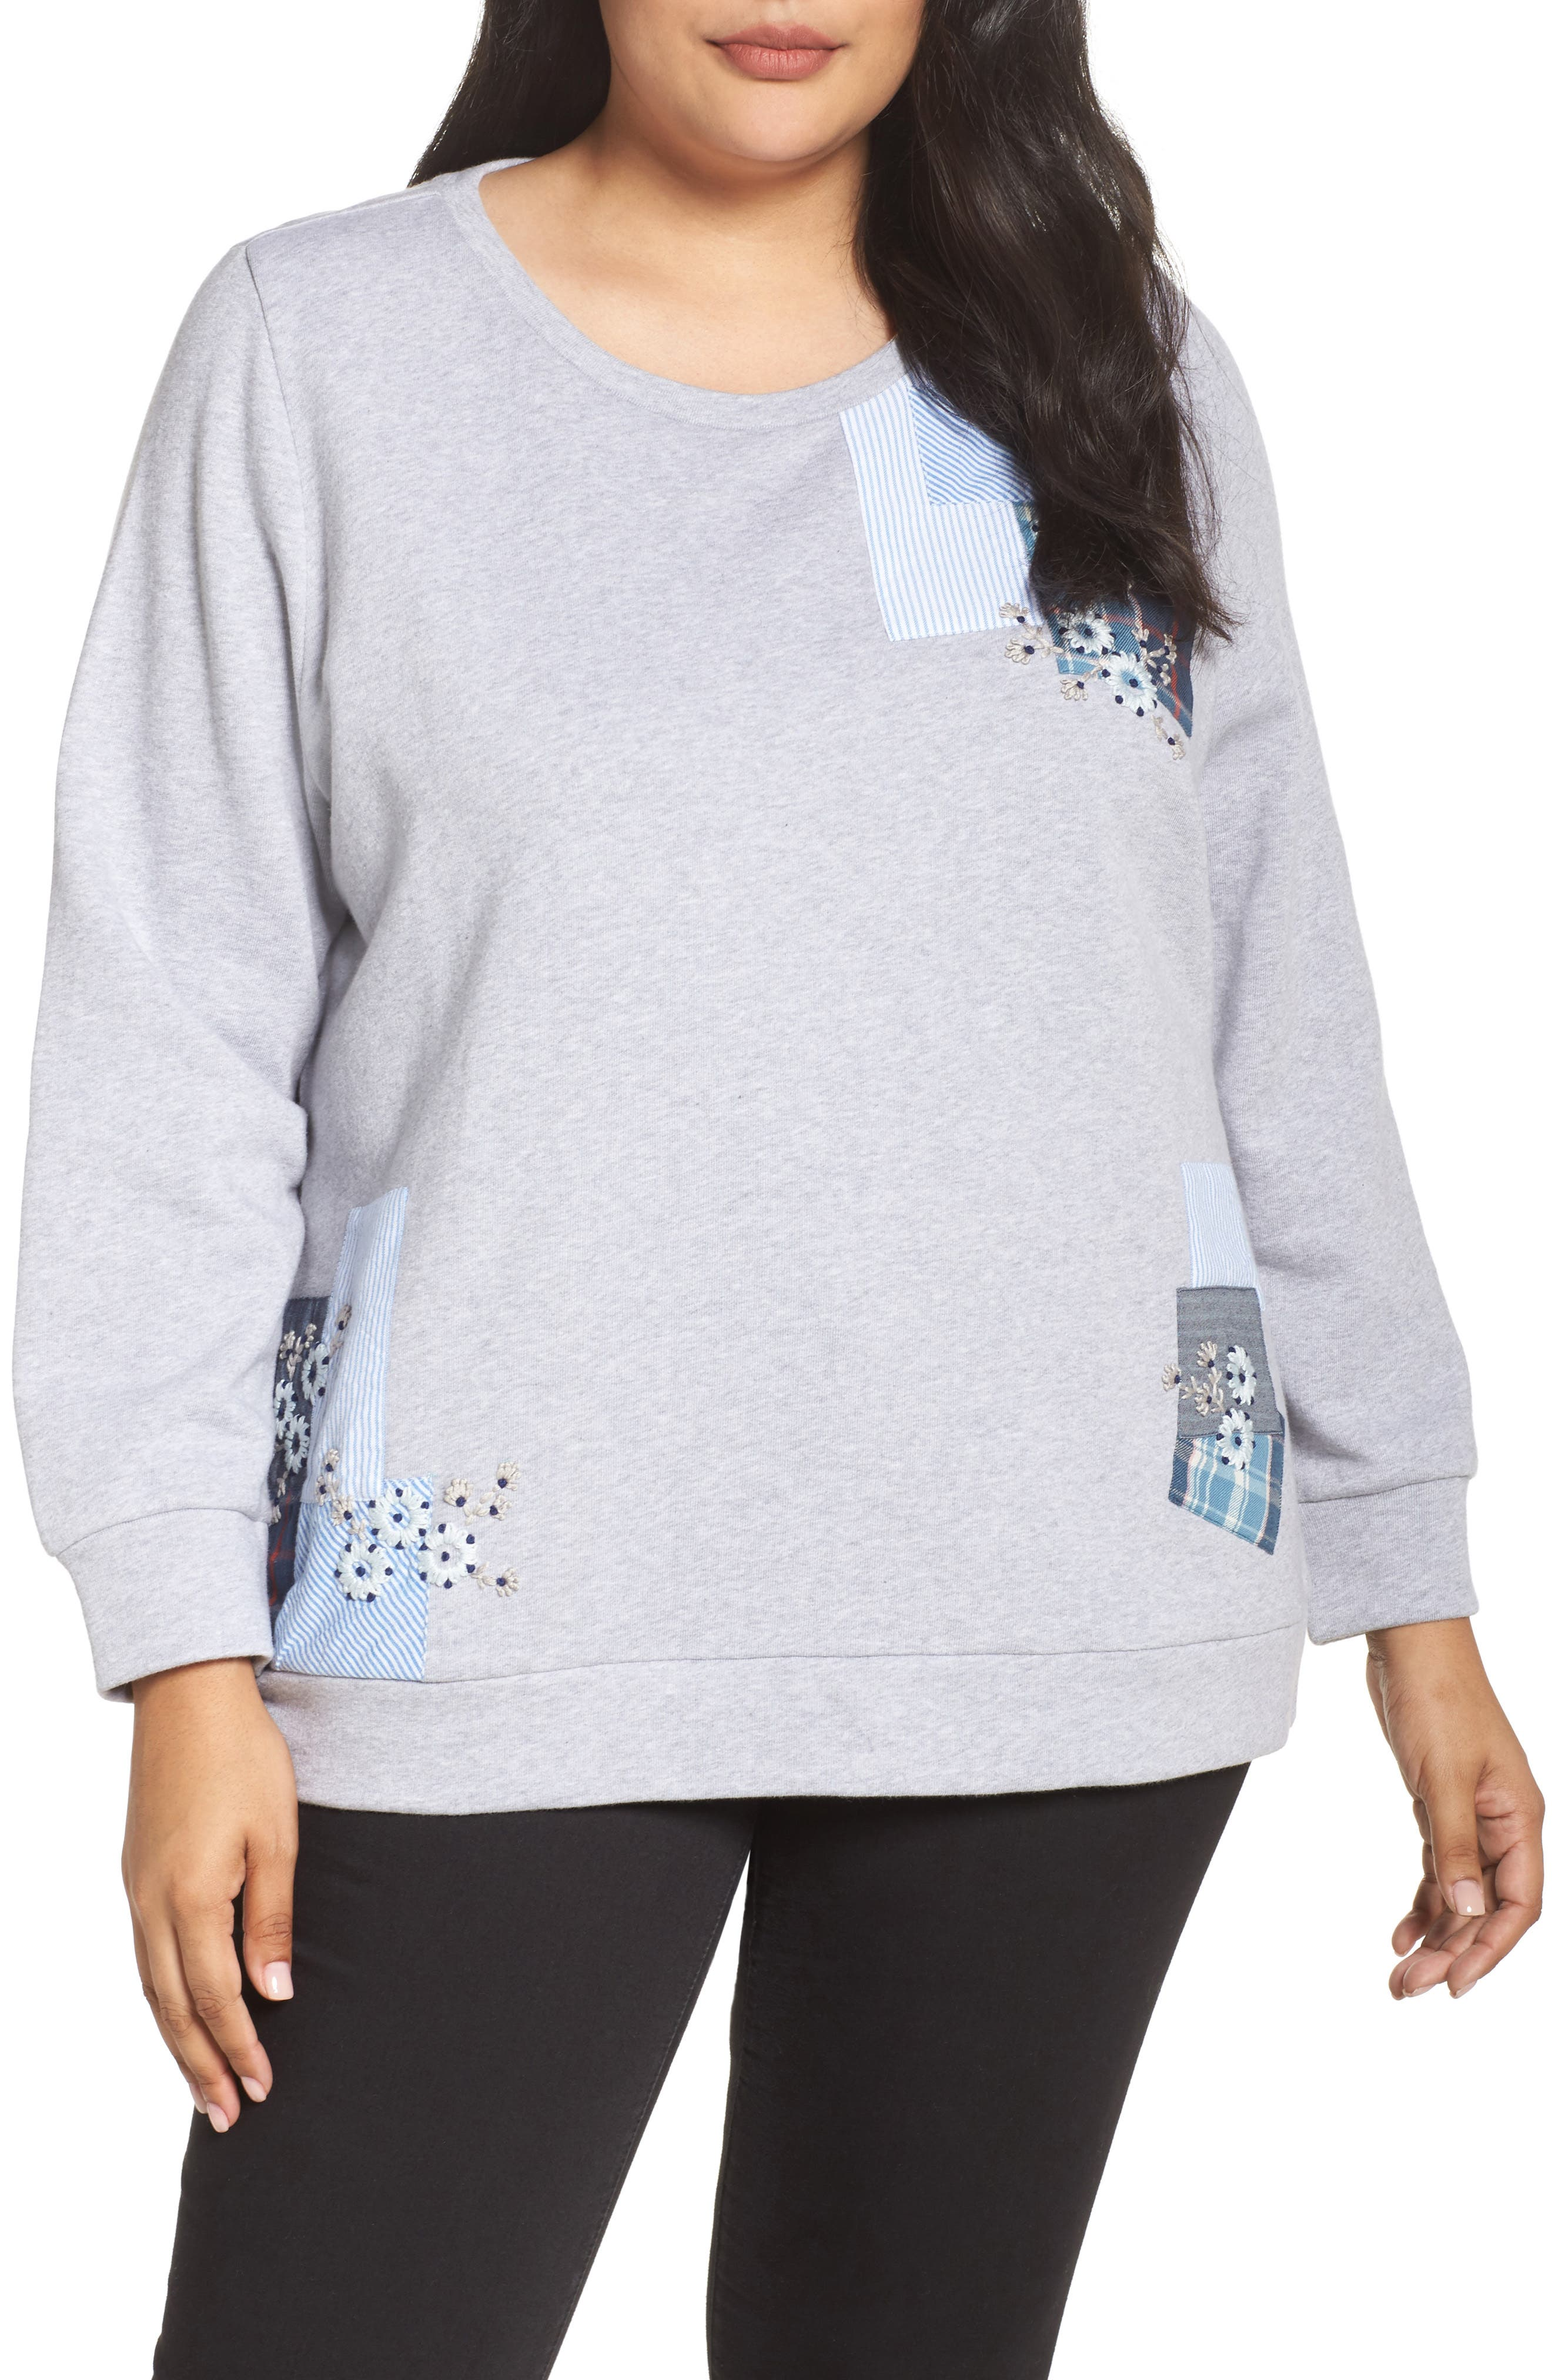 Patchwork Sweatshirt,                         Main,                         color, Grey Floral